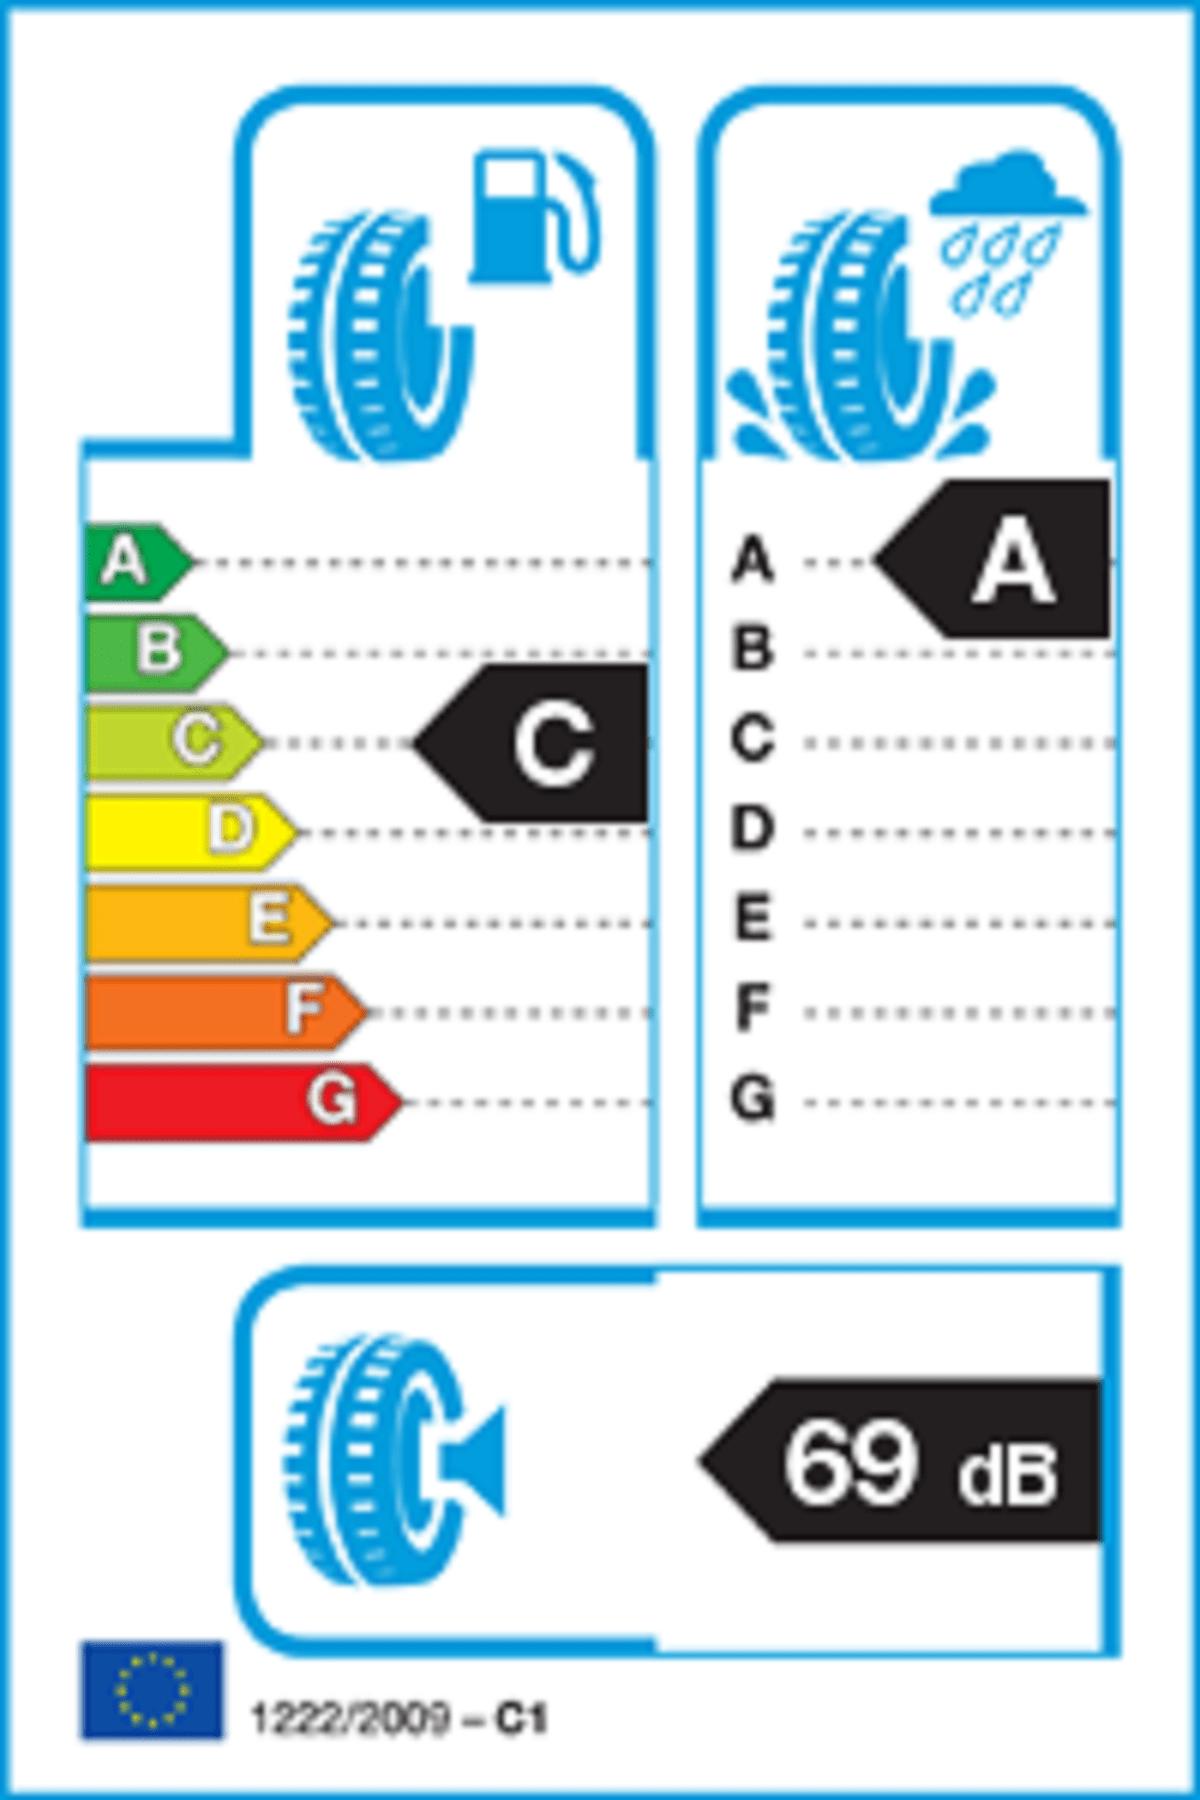 Dunlop 215/55 R17 94W Sp Sport Fm800 Oto Lastik (Üretim Yılı: 2020) 1